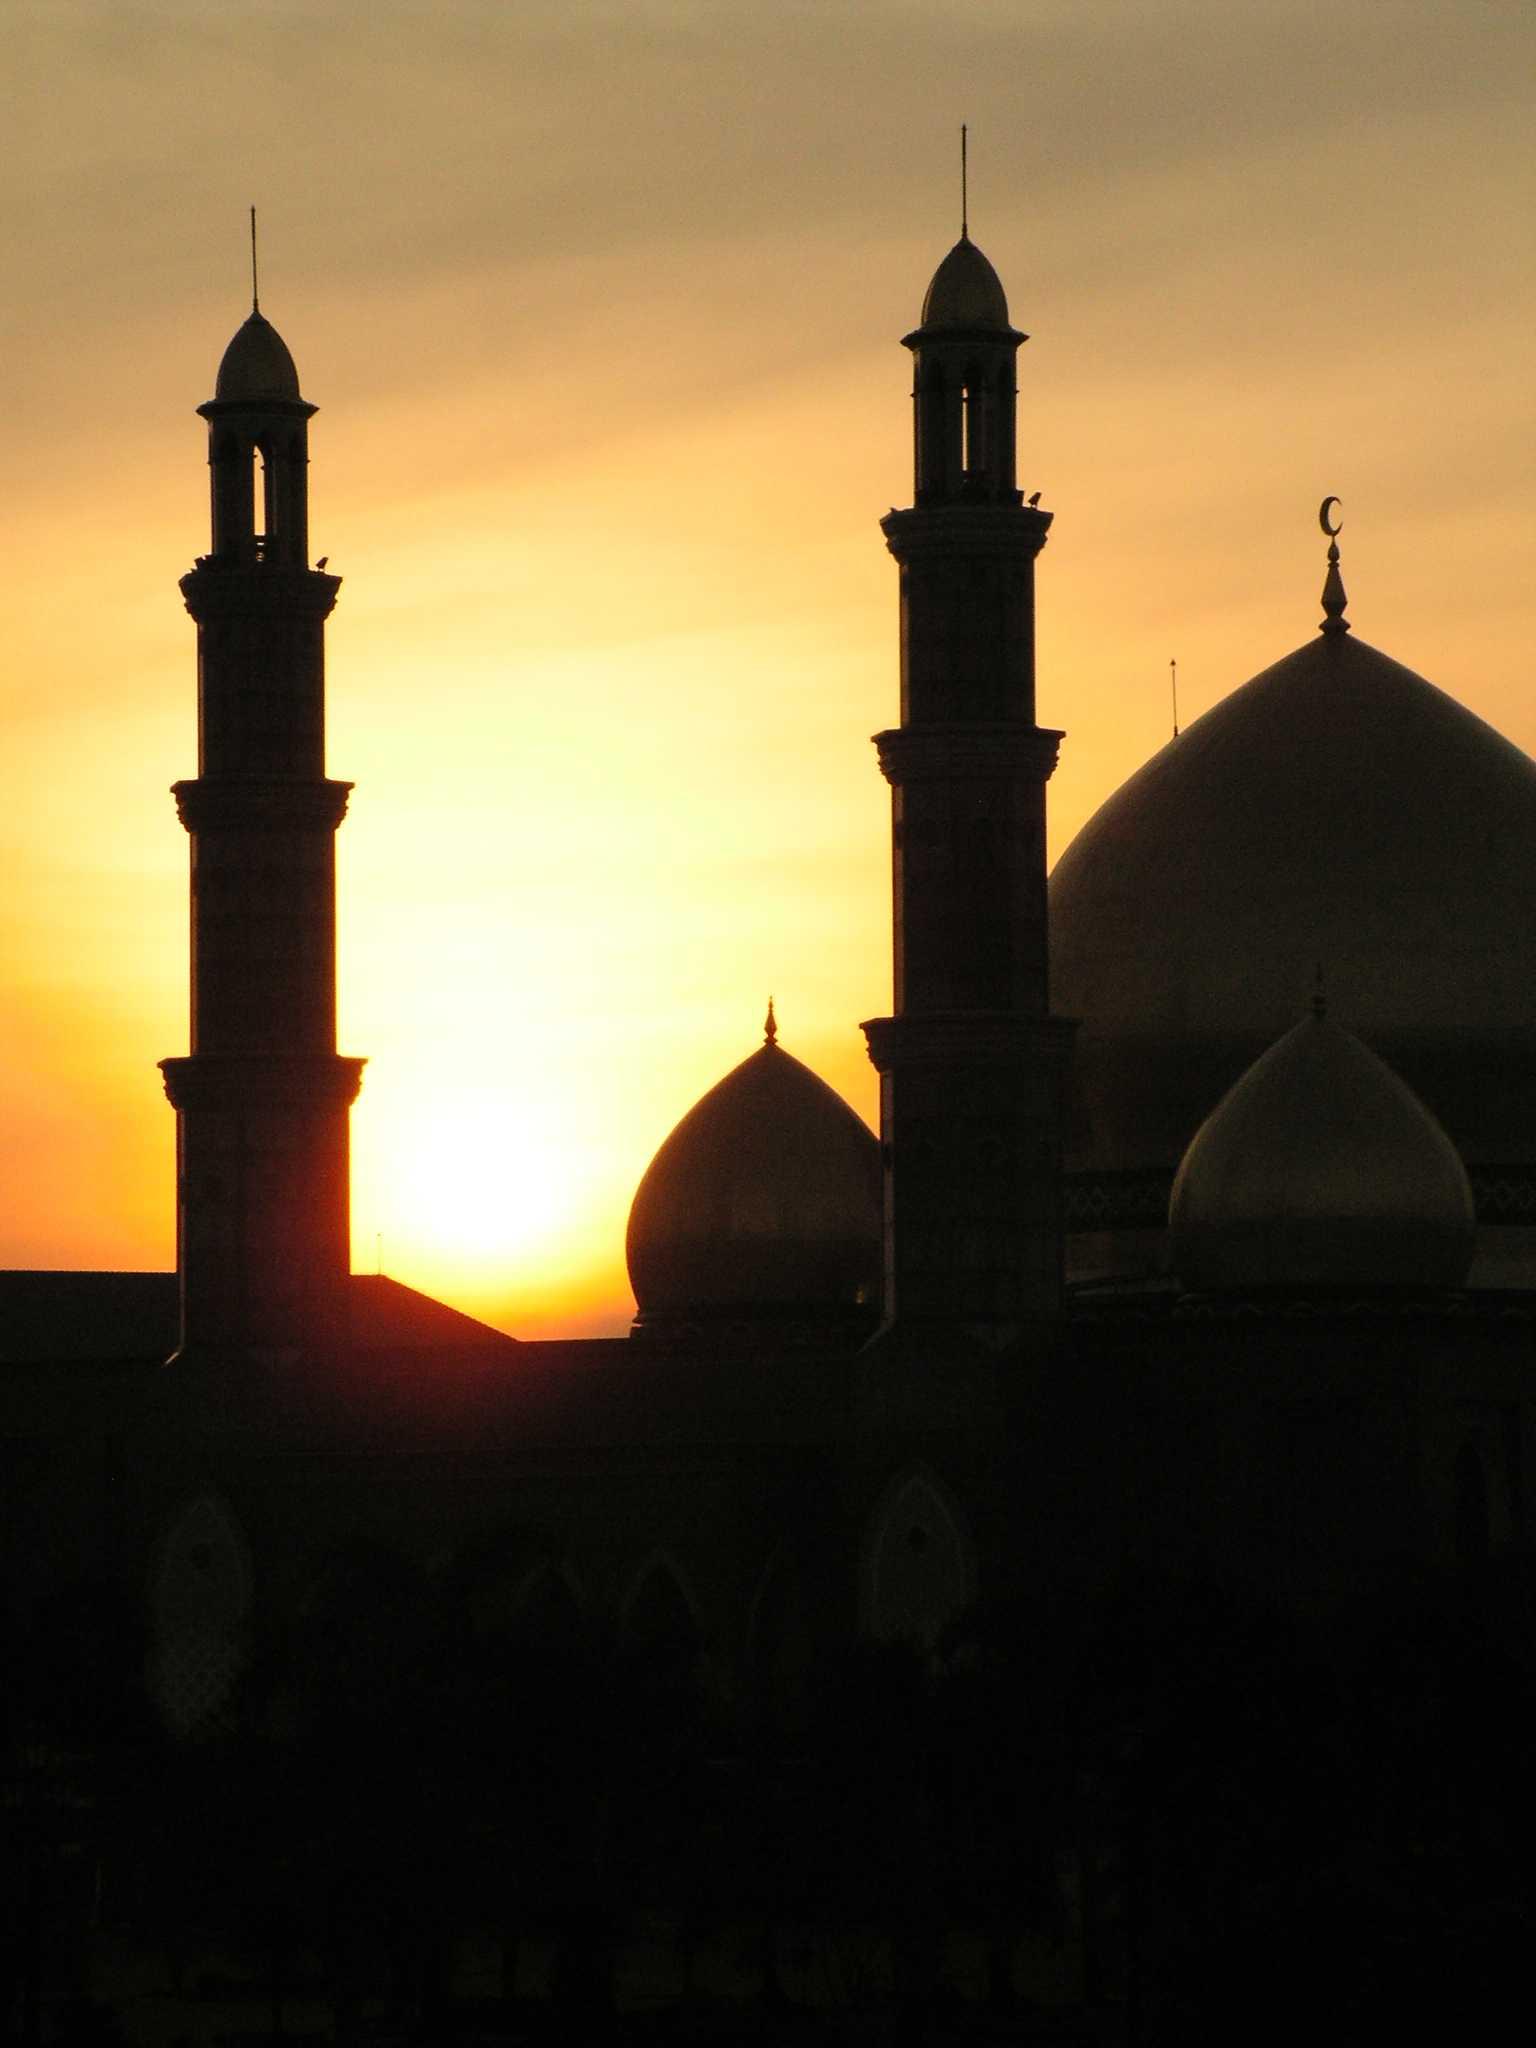 Pt. Garisprada Kubah Emas Mosque Meruyung, Limo, Depok City, West Java, Indonesia Depok Kubah Klasik  22026